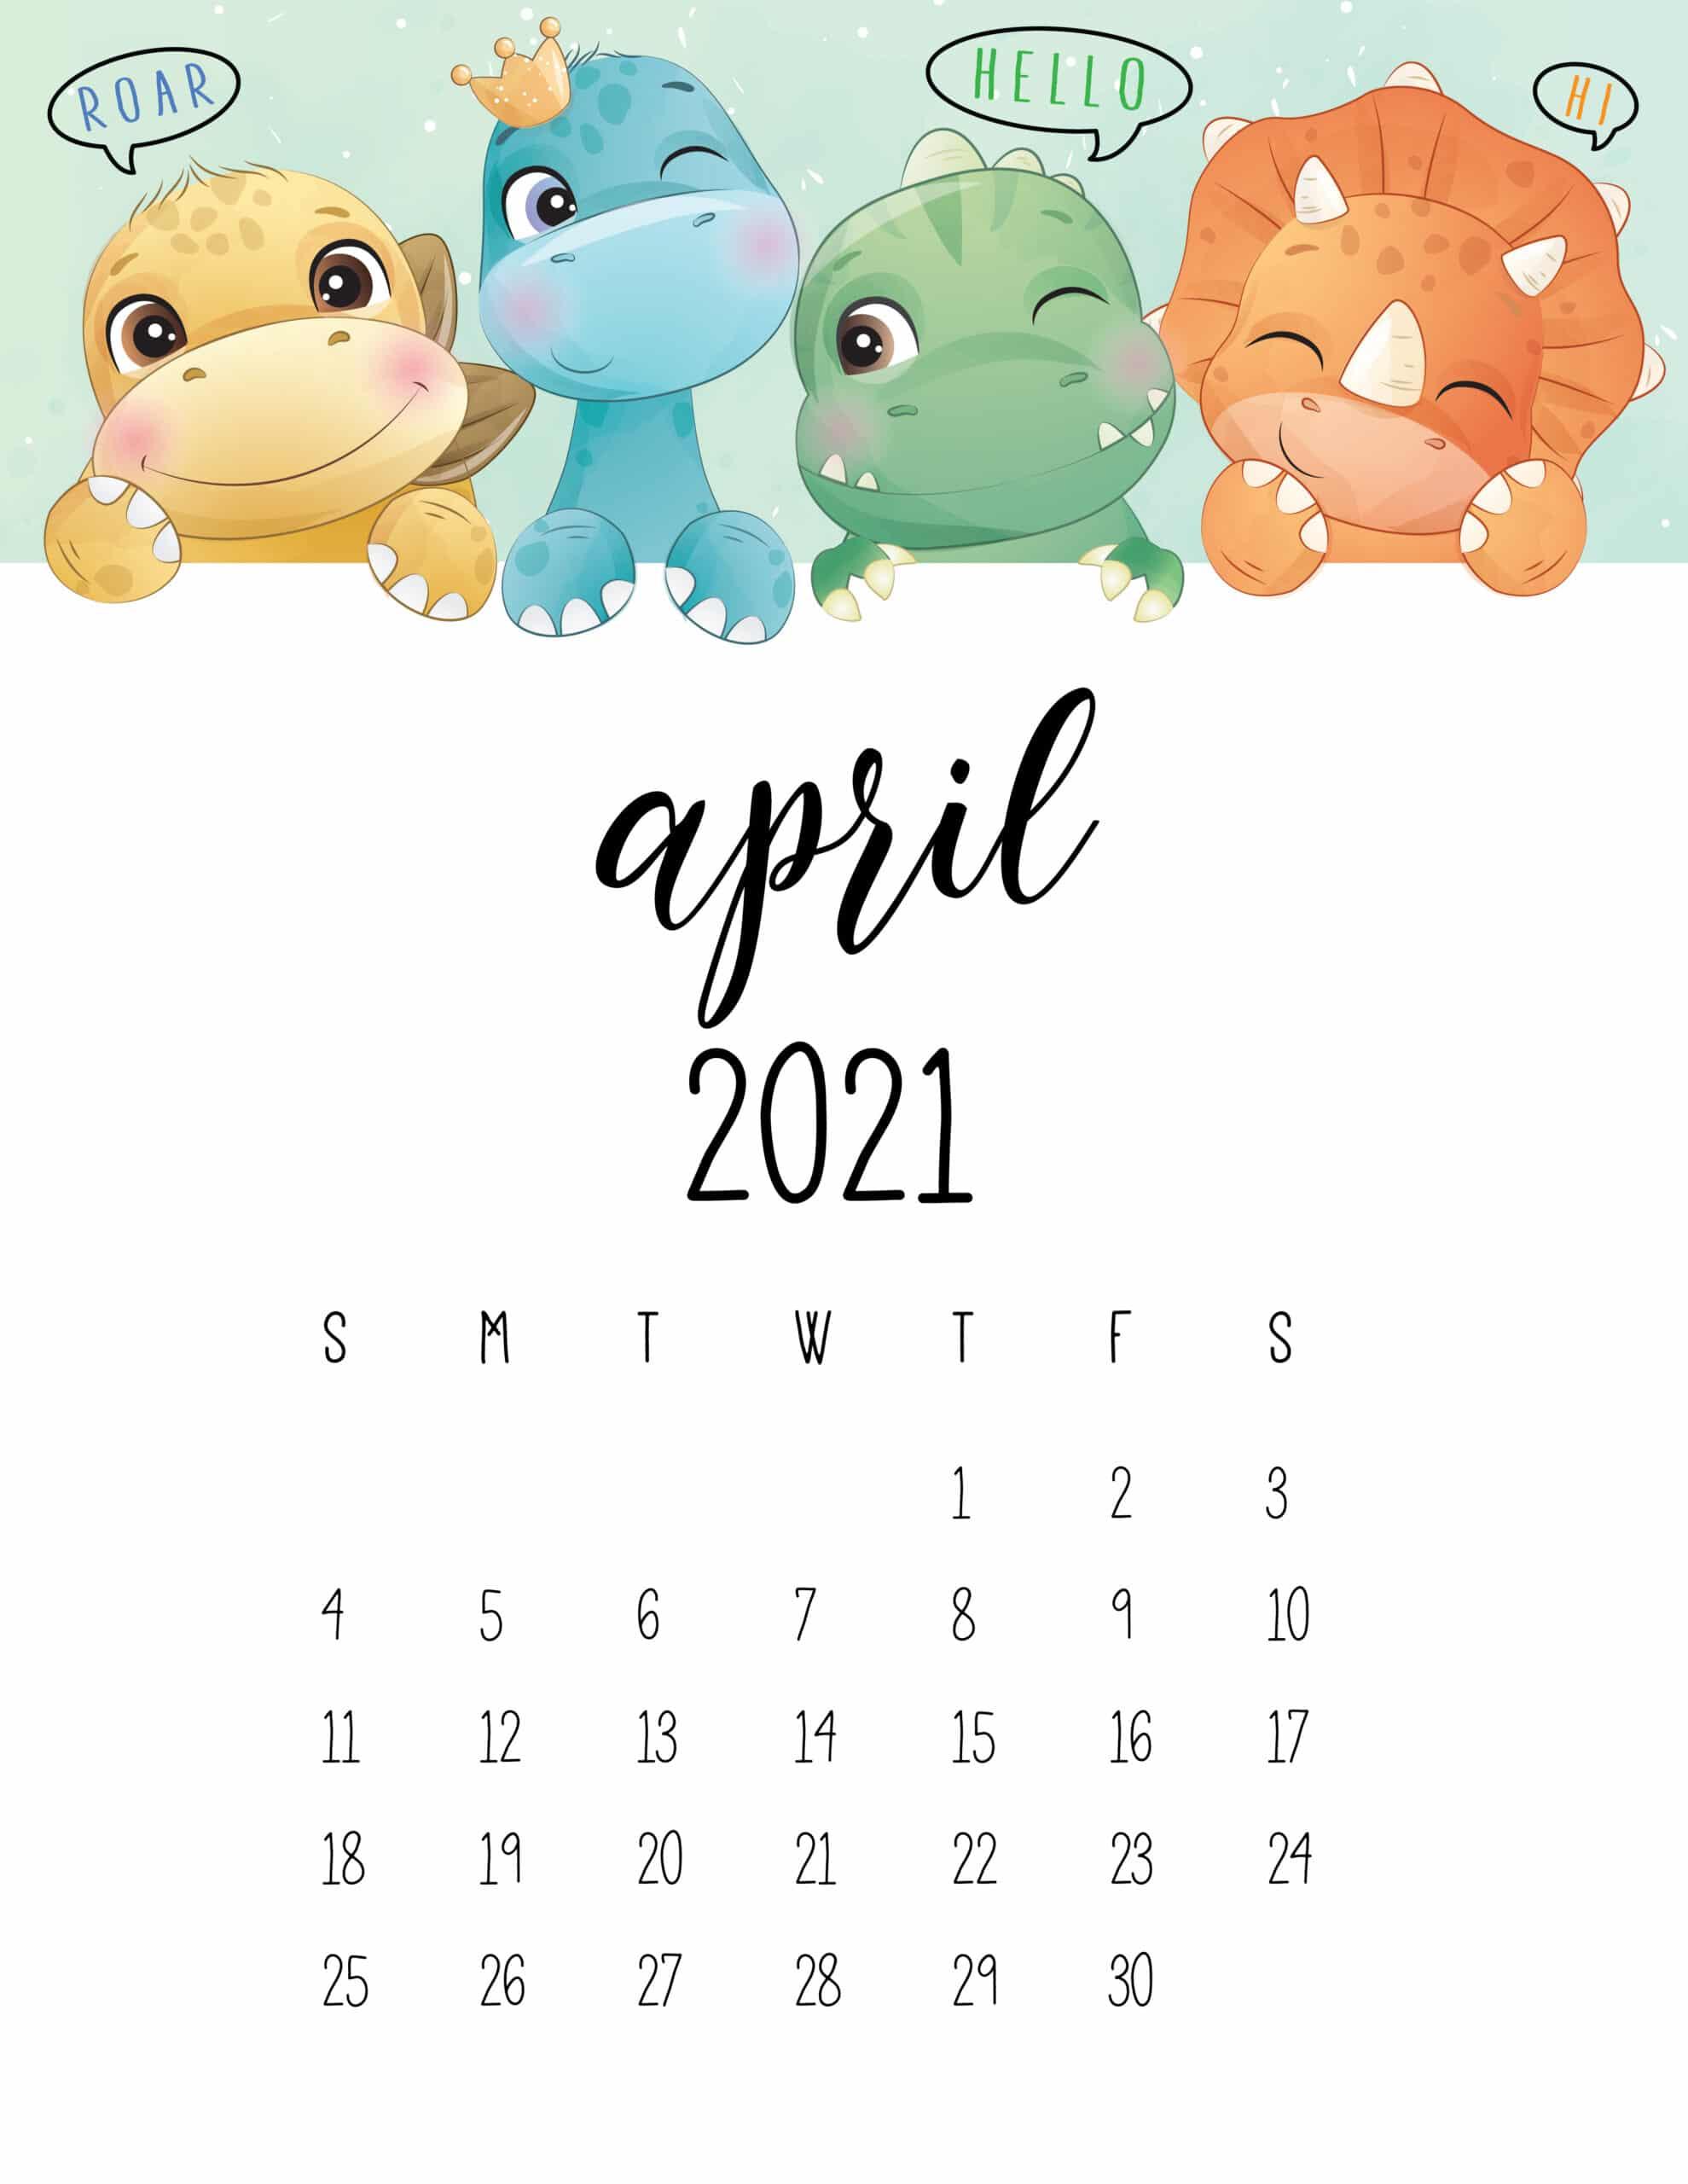 Cute April 2021 Calendar for Kids